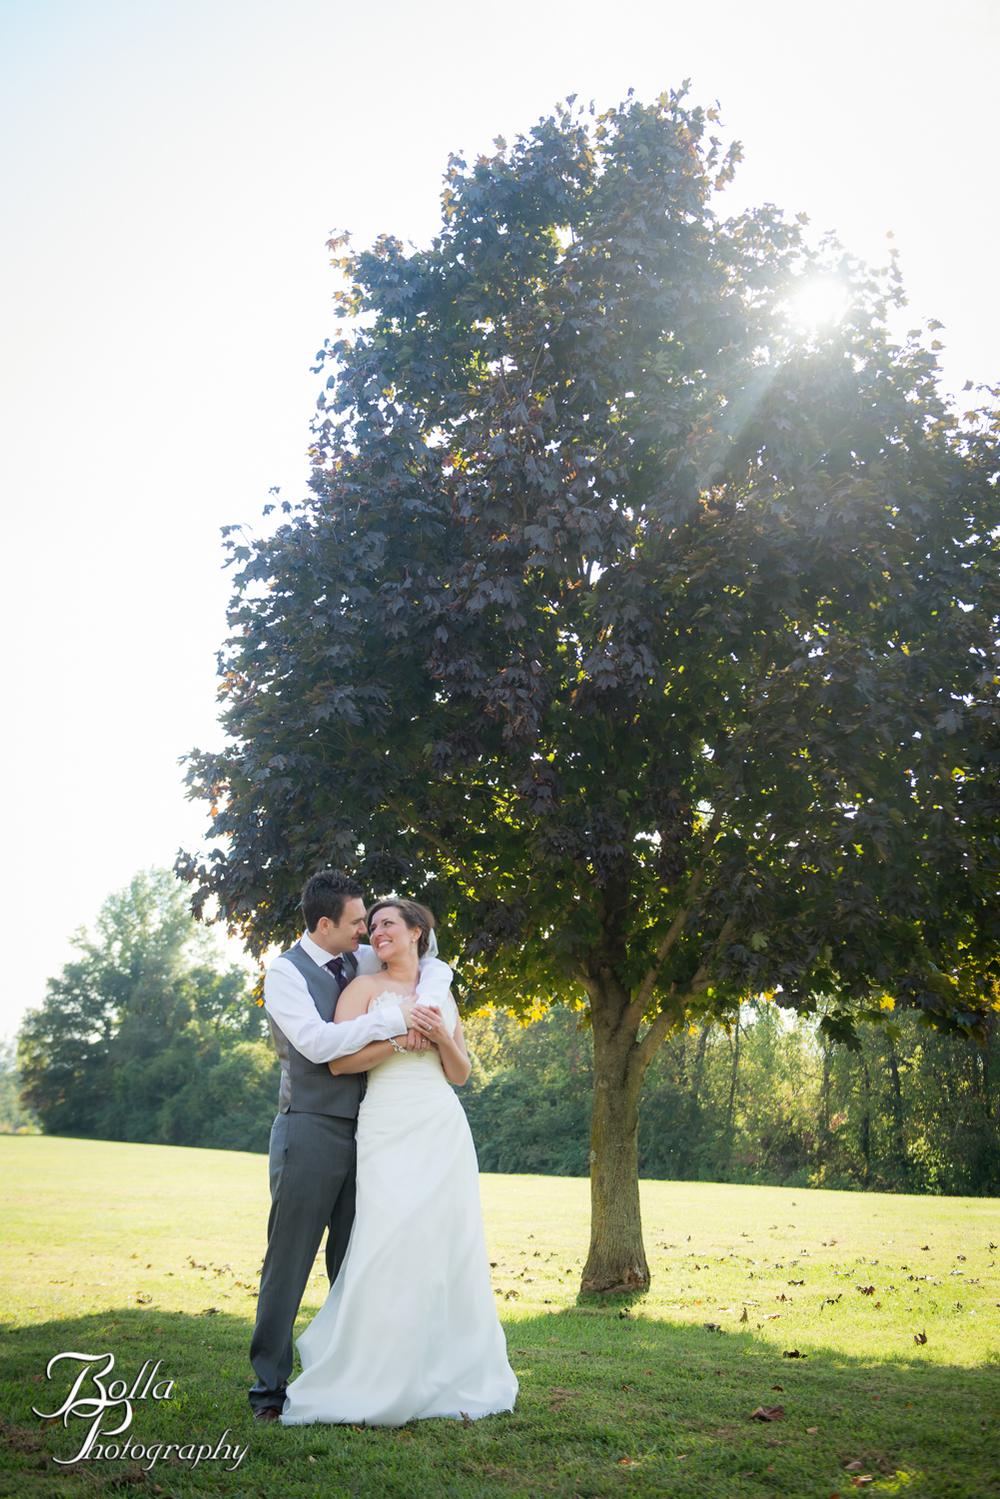 Bolla_Photography_St_Louis_wedding_photographer-0353.jpg